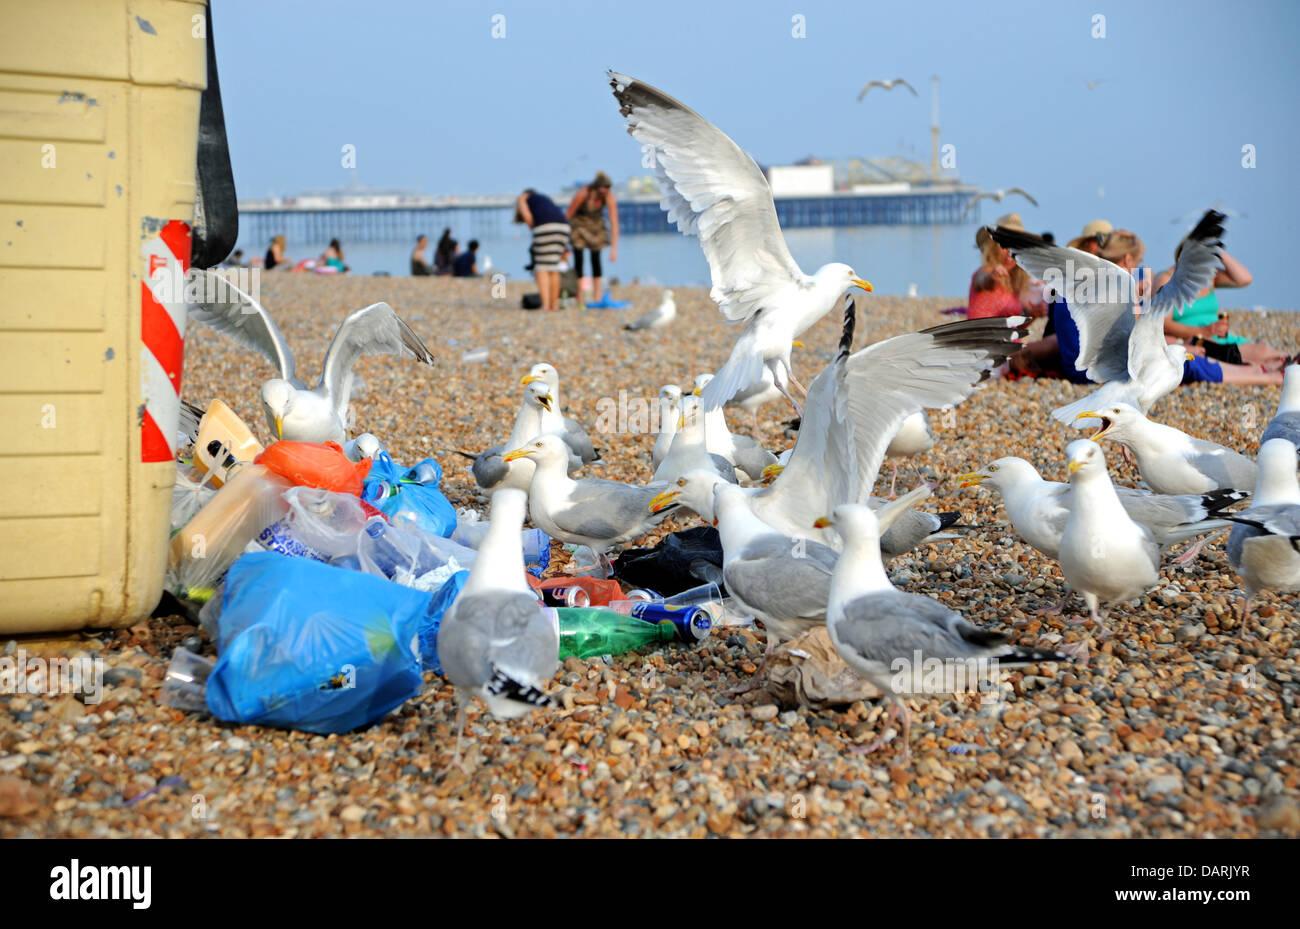 Herring Gulls or seagulls feasting on rubbish by communal bins on Brighton beach UK - Stock Image